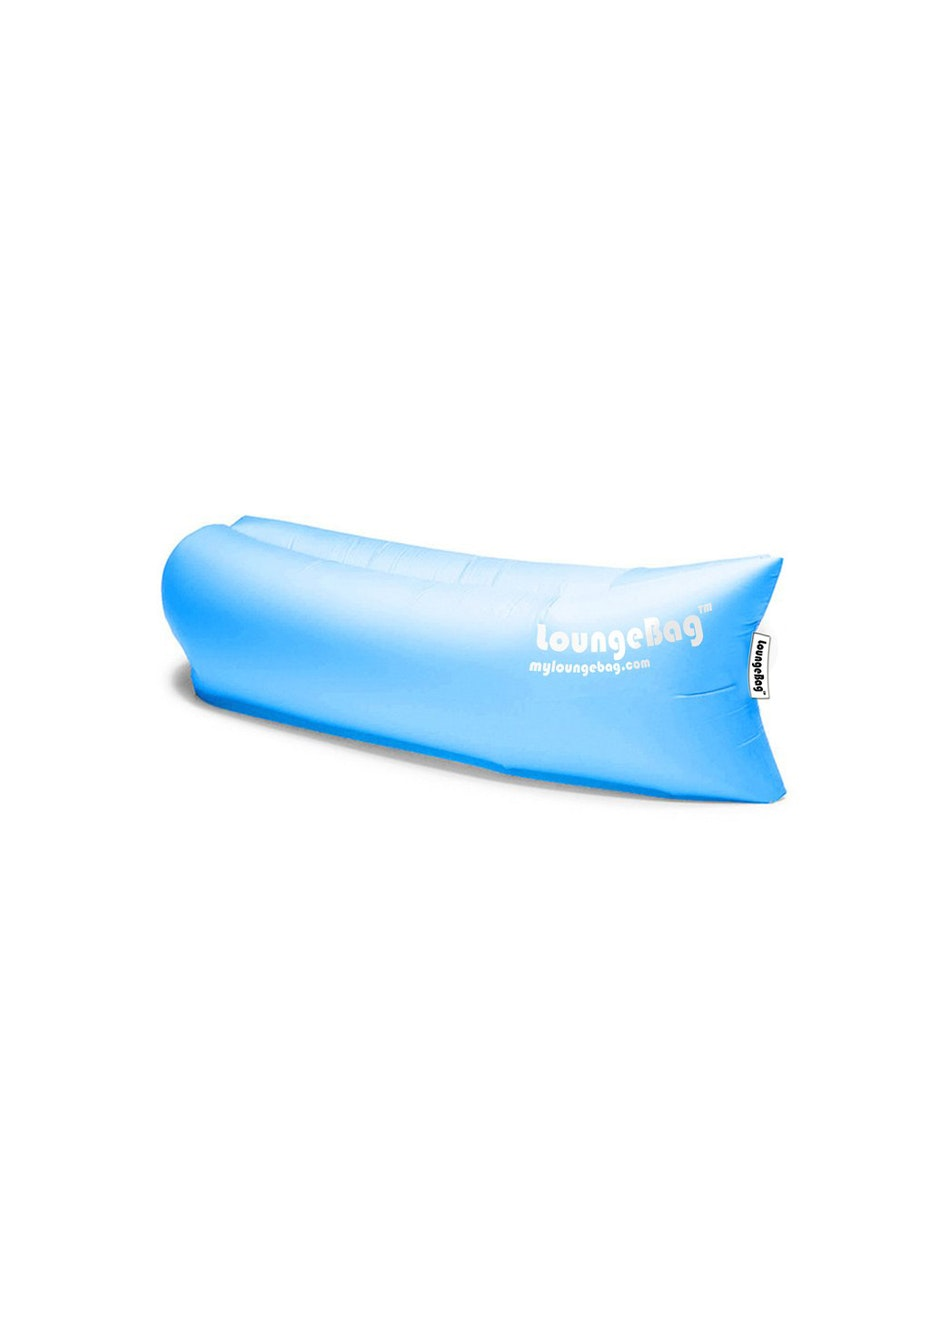 Brilliant Inflatable Loungebag - No Pump Needed - Blue